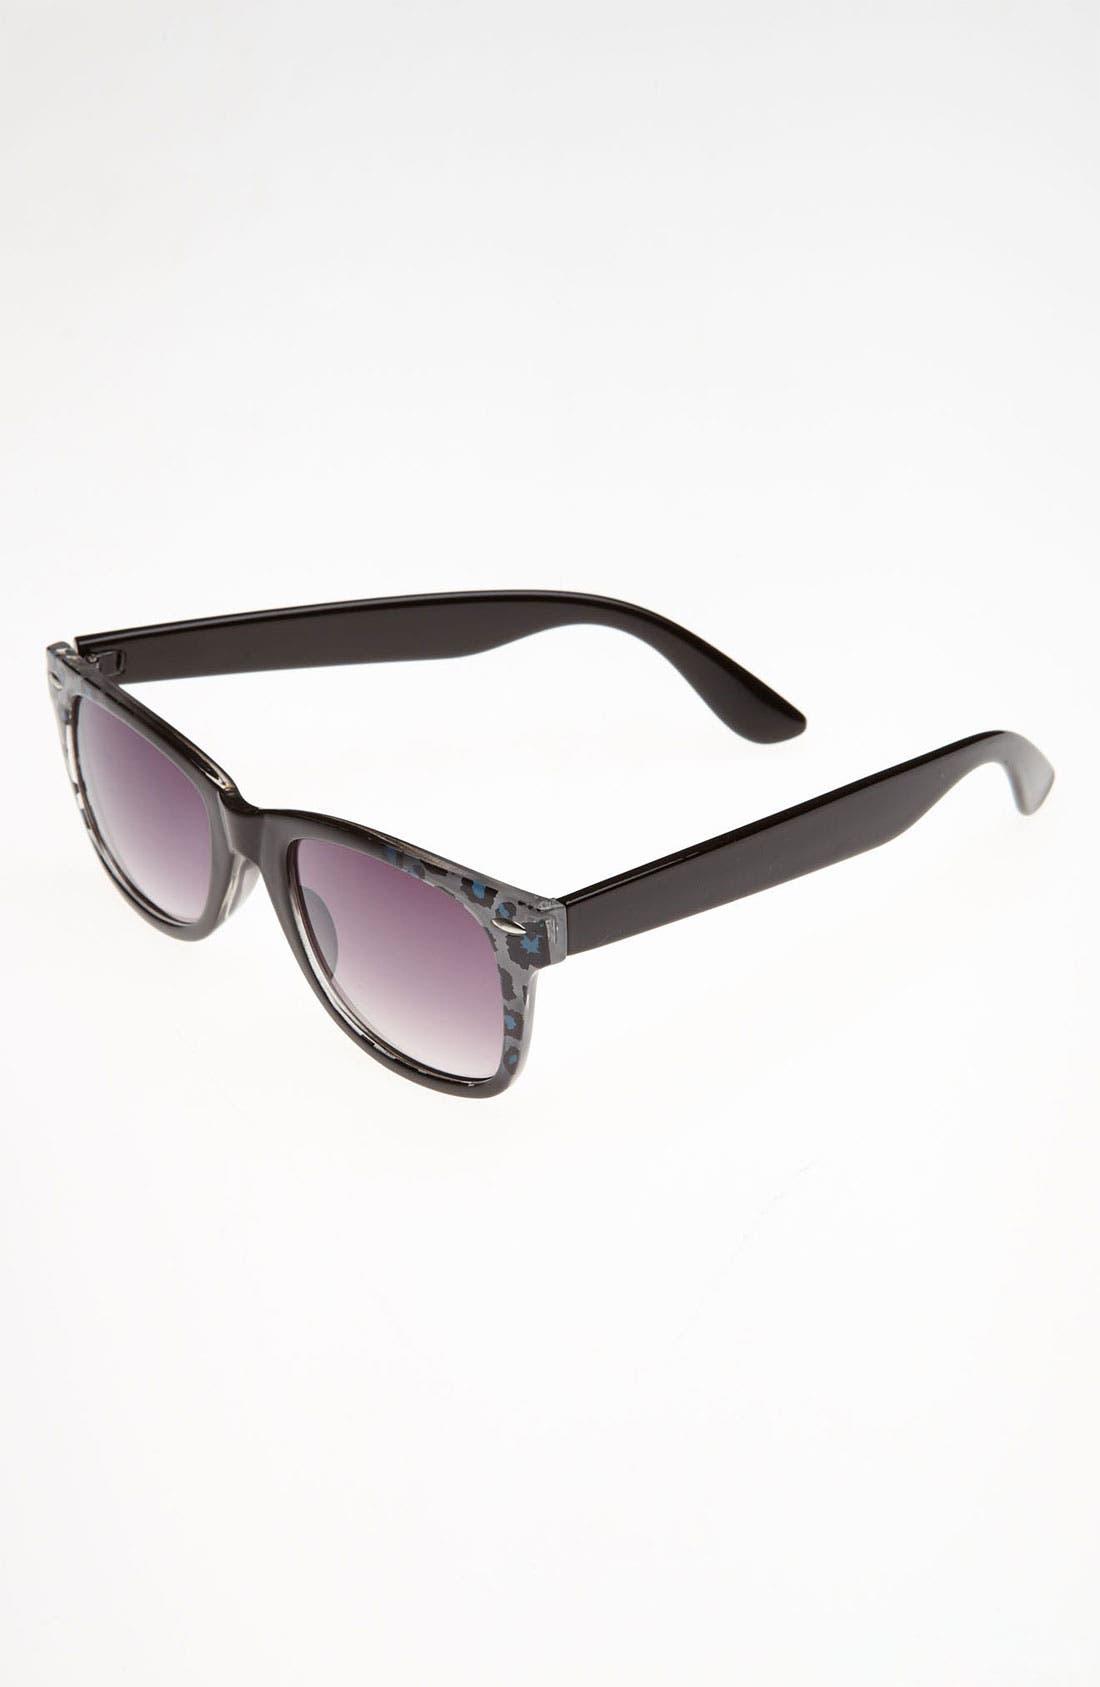 Main Image - Icon Eyewear 'Leopard' Sunglasses (Girls)